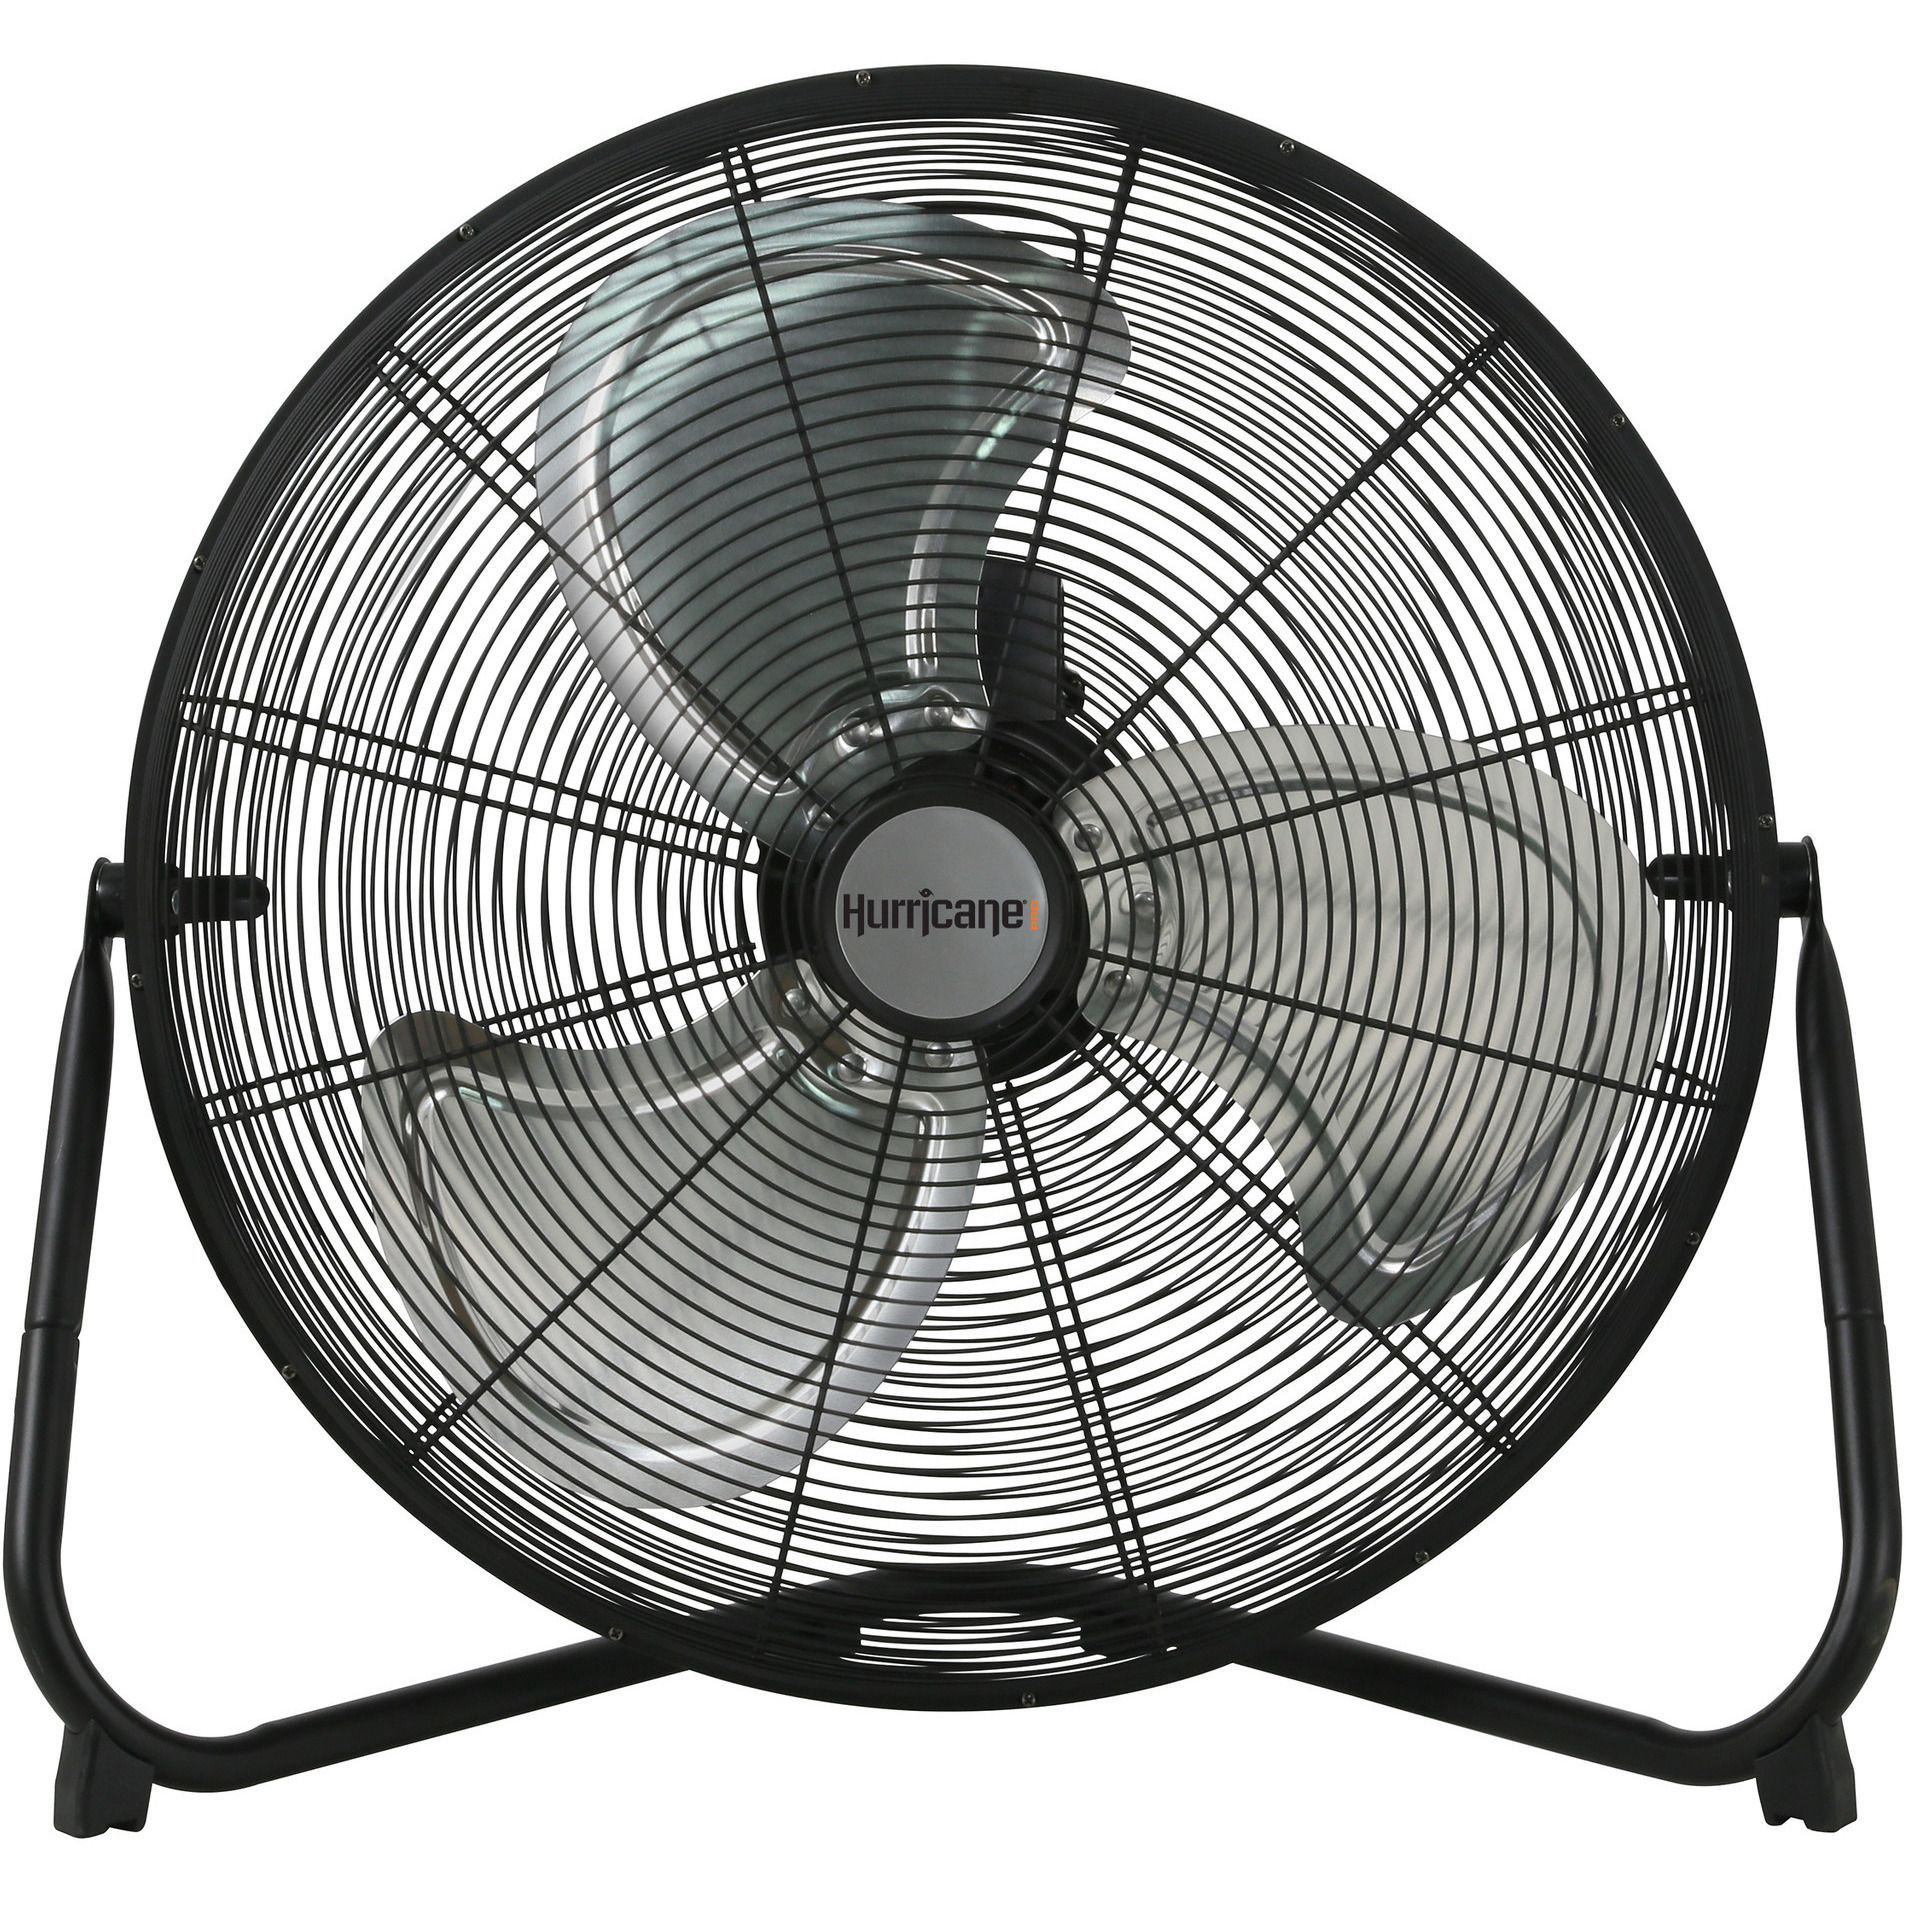 Hurricane Pro 20 Inch High Velocity Metal Floor Fan